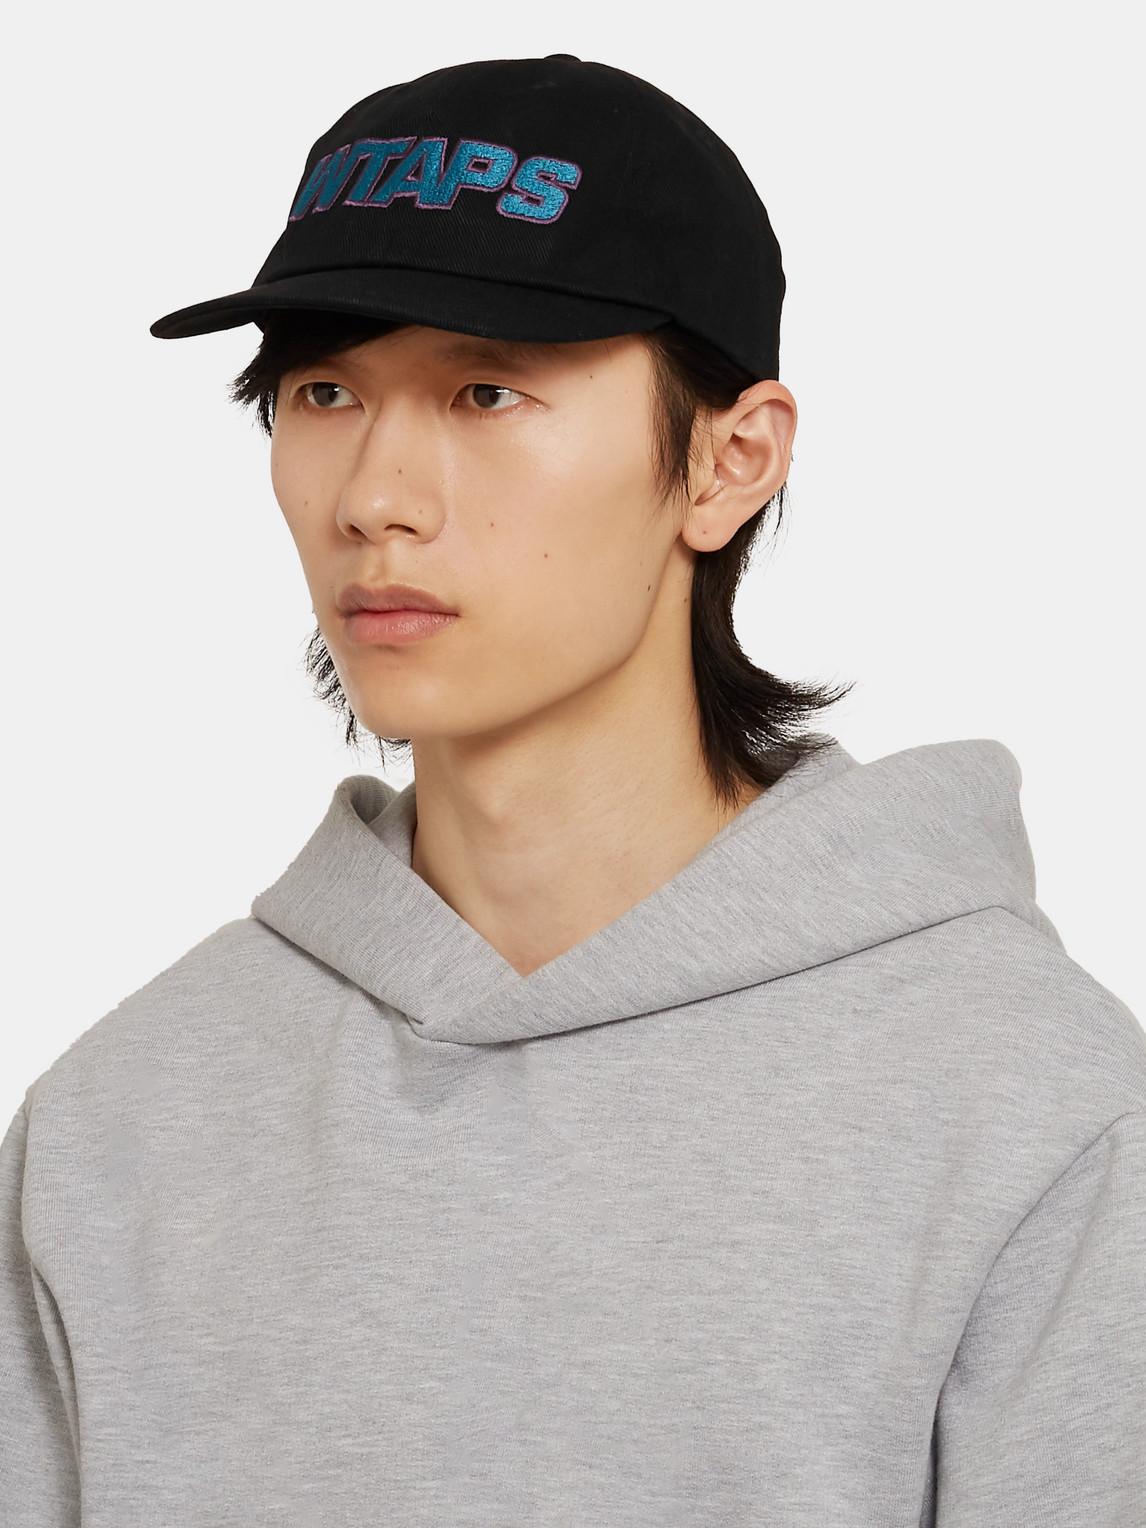 Wtaps Logo-embroidered Cotton-twill Baseball Cap In Black